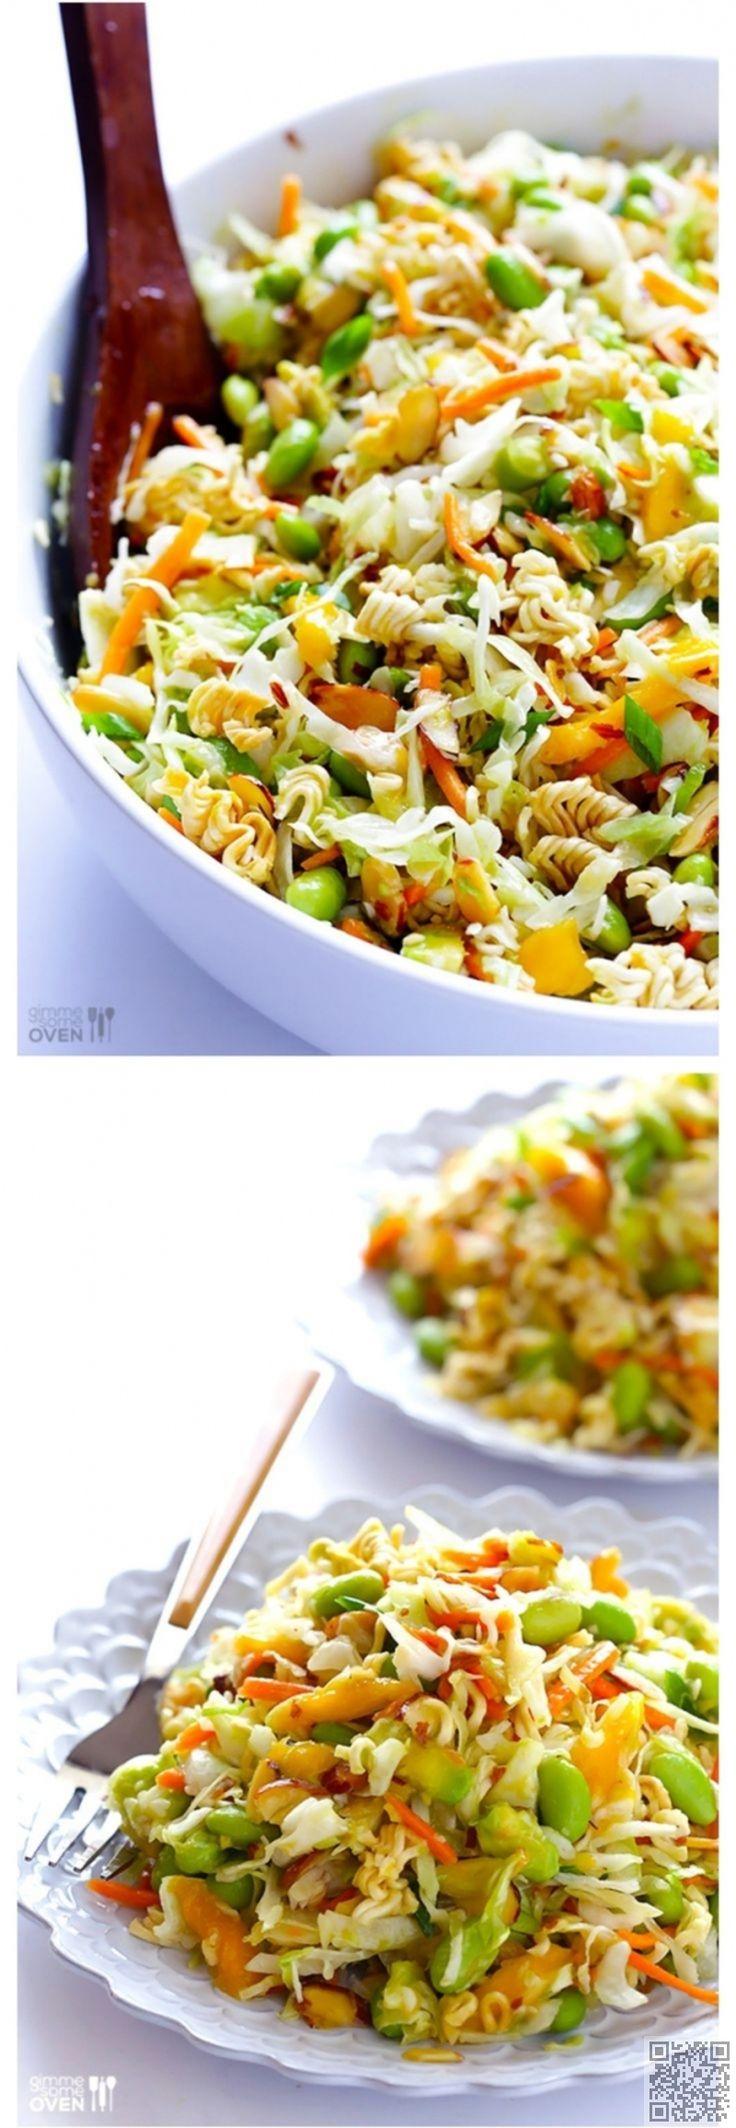 3. #salade de nouilles de #Ramen asiatique #croquant - 17 Inspos de…